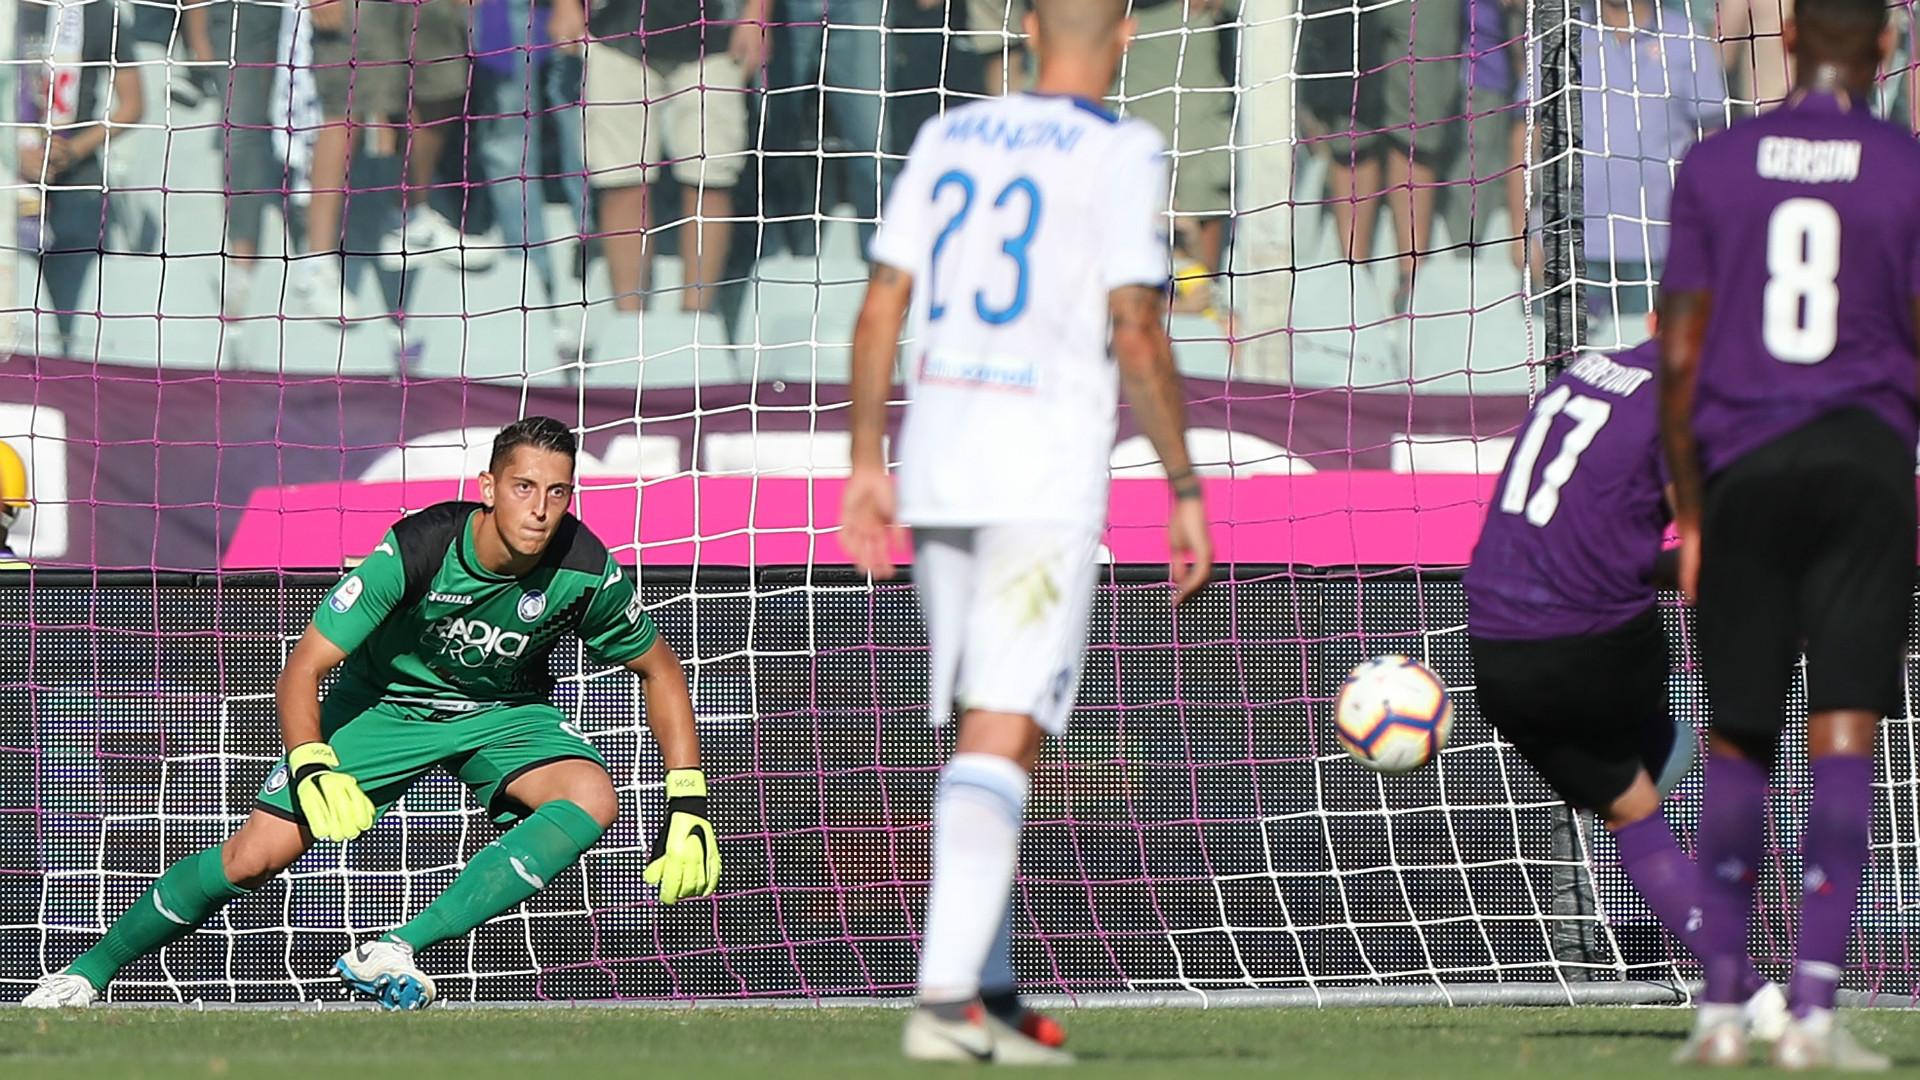 Veretout Fiorentina Atalanta